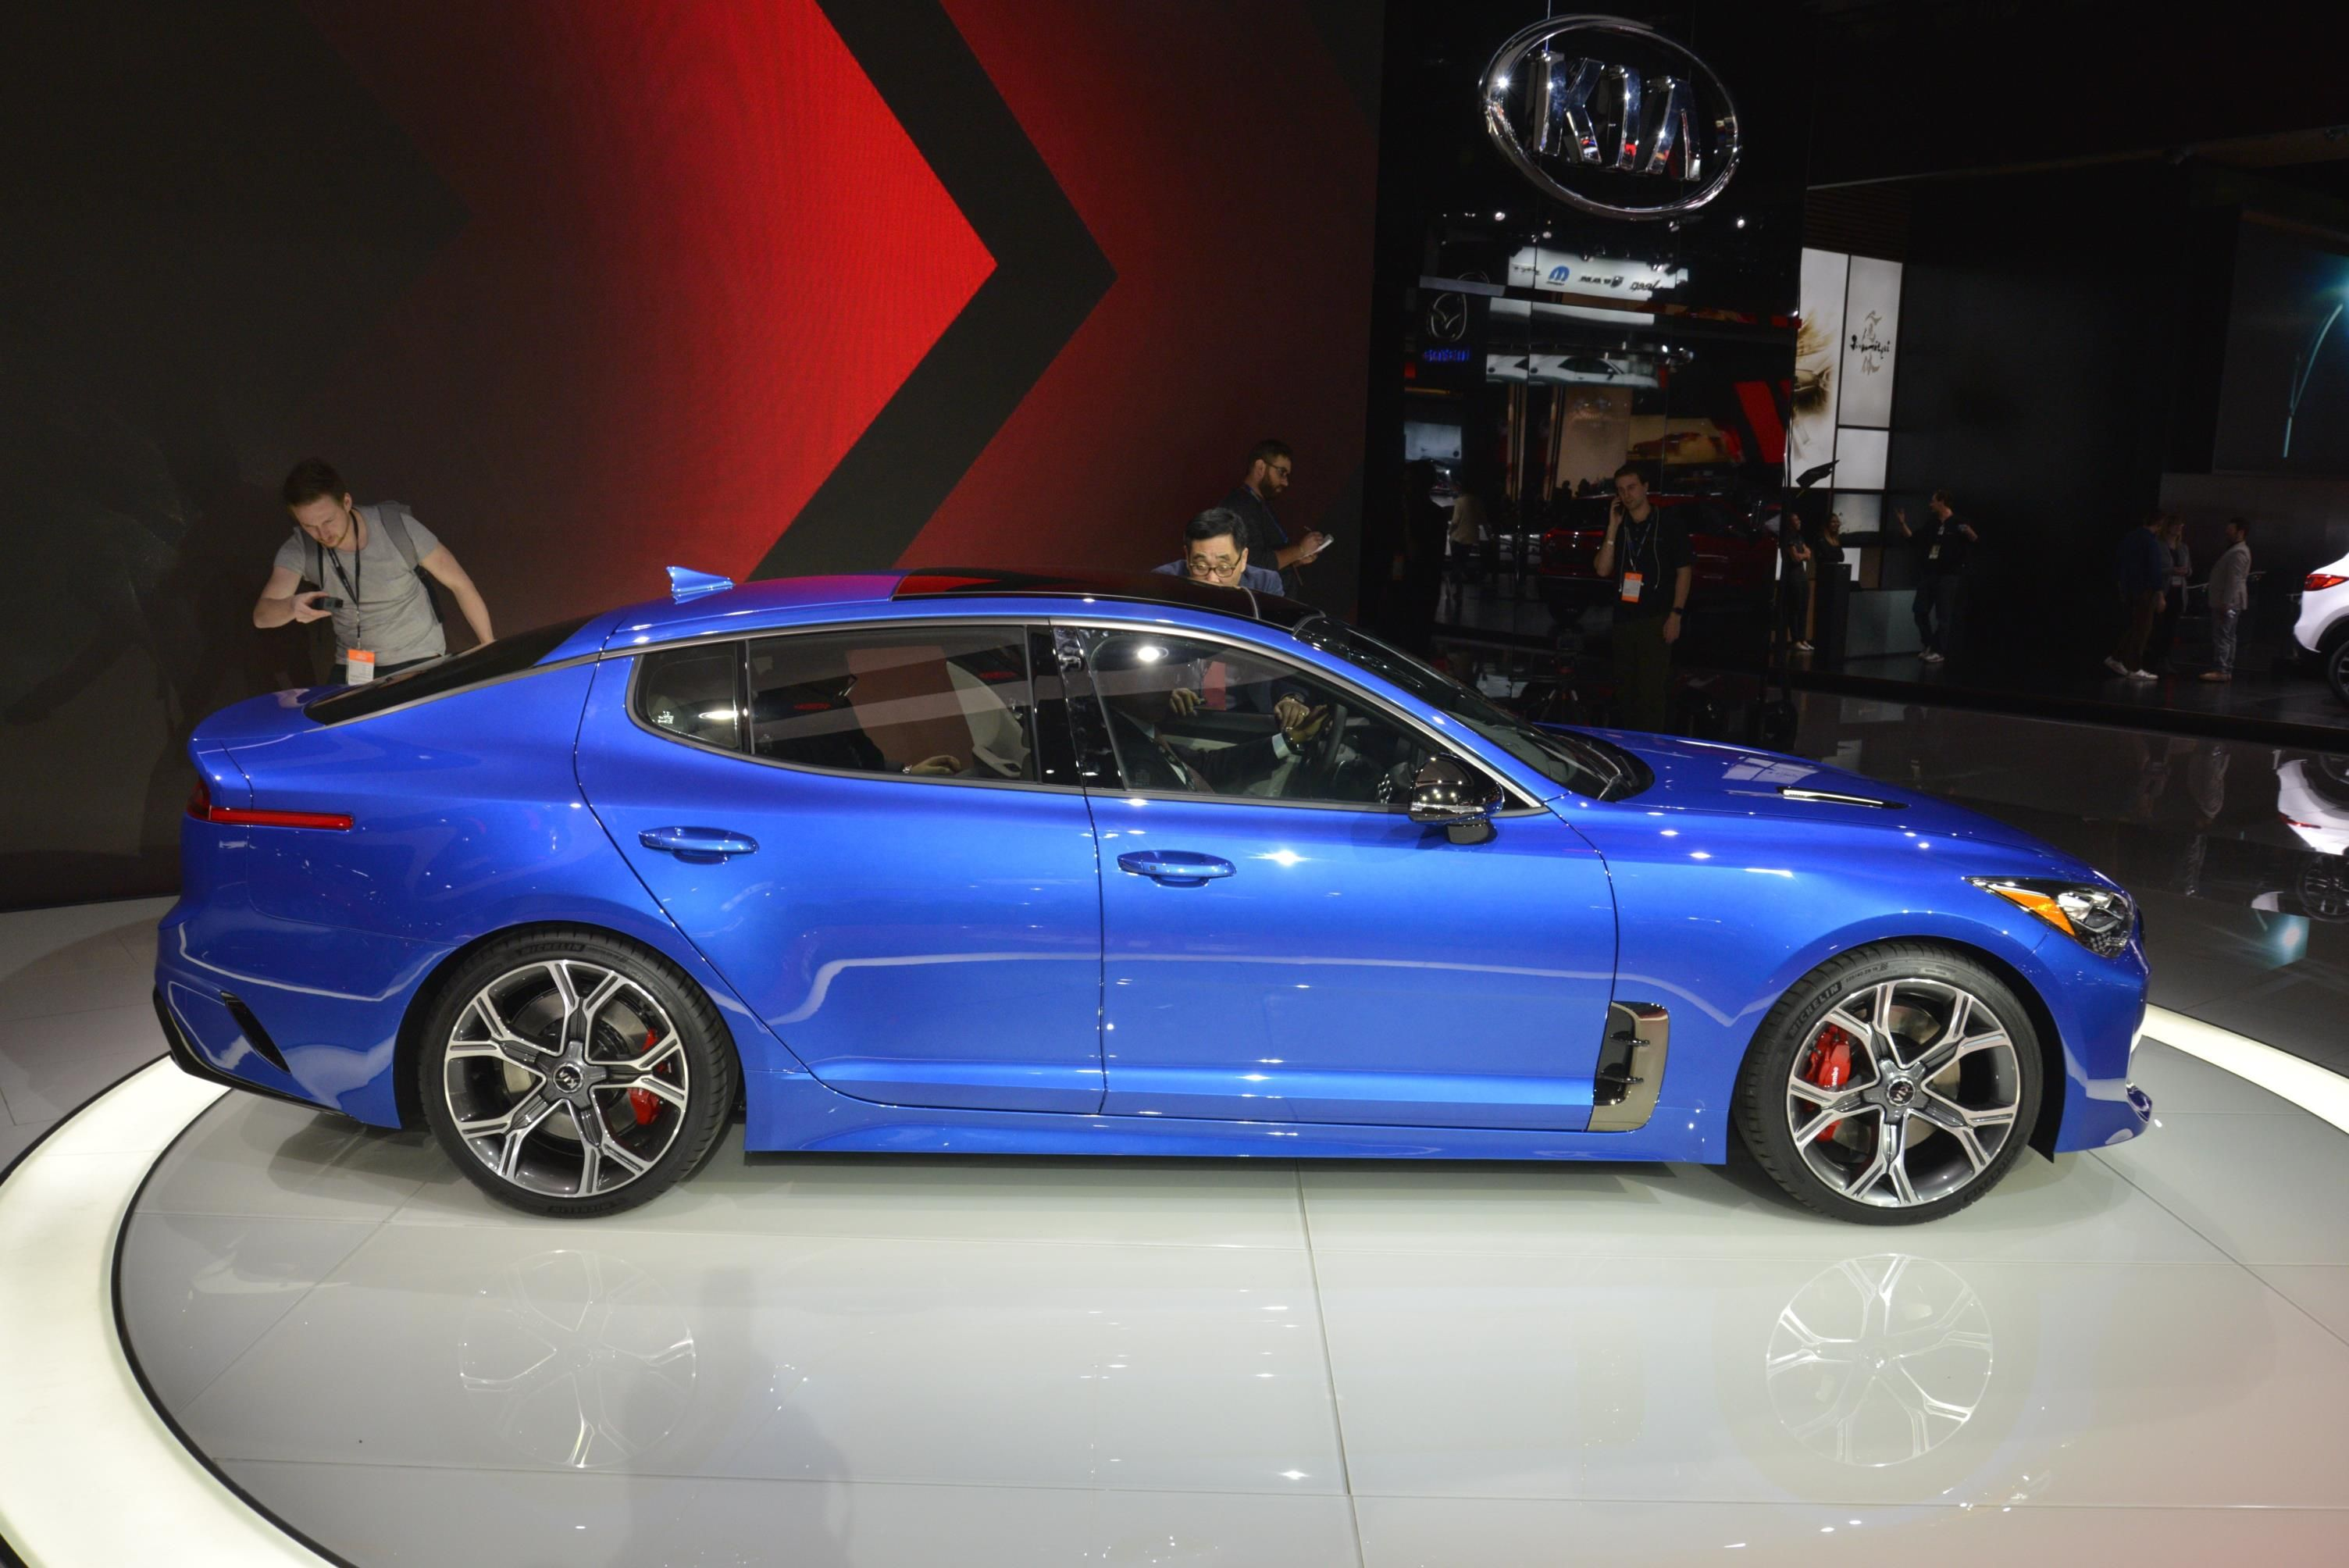 2017 Detroit Auto Show 2018 Kia Stinger Kia Stinger Kia Porsche Panamera